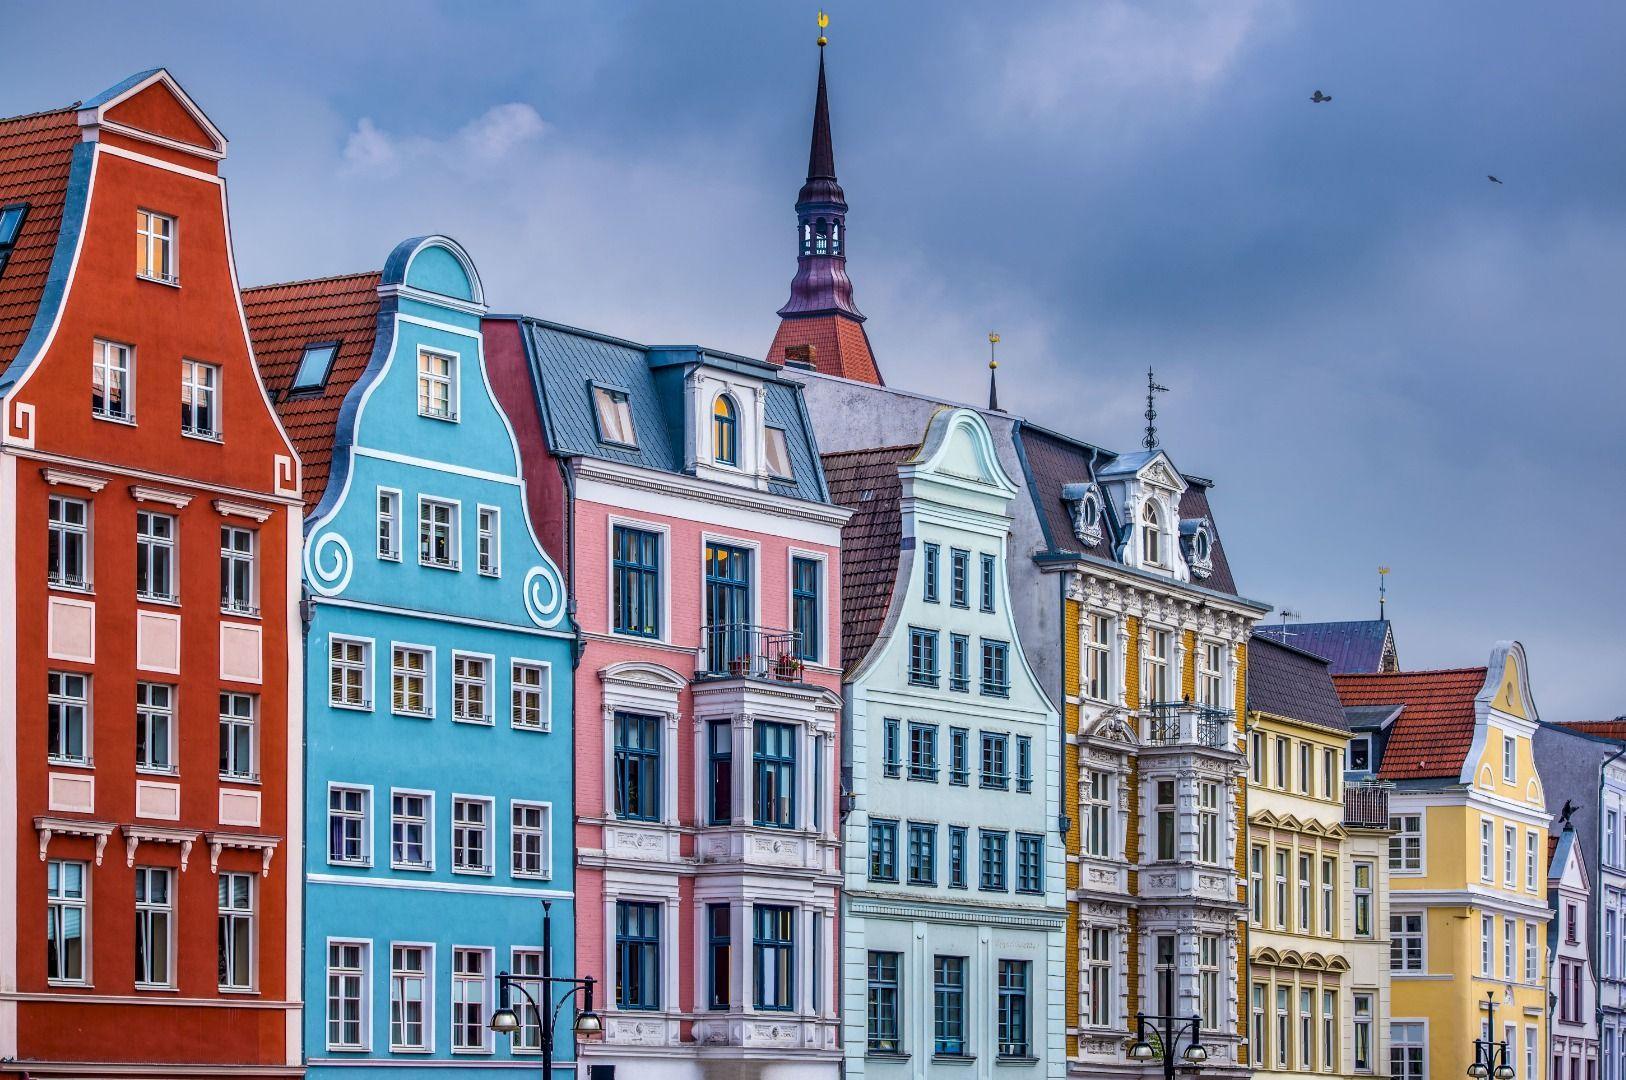 Hochzeitslocations in Rostock